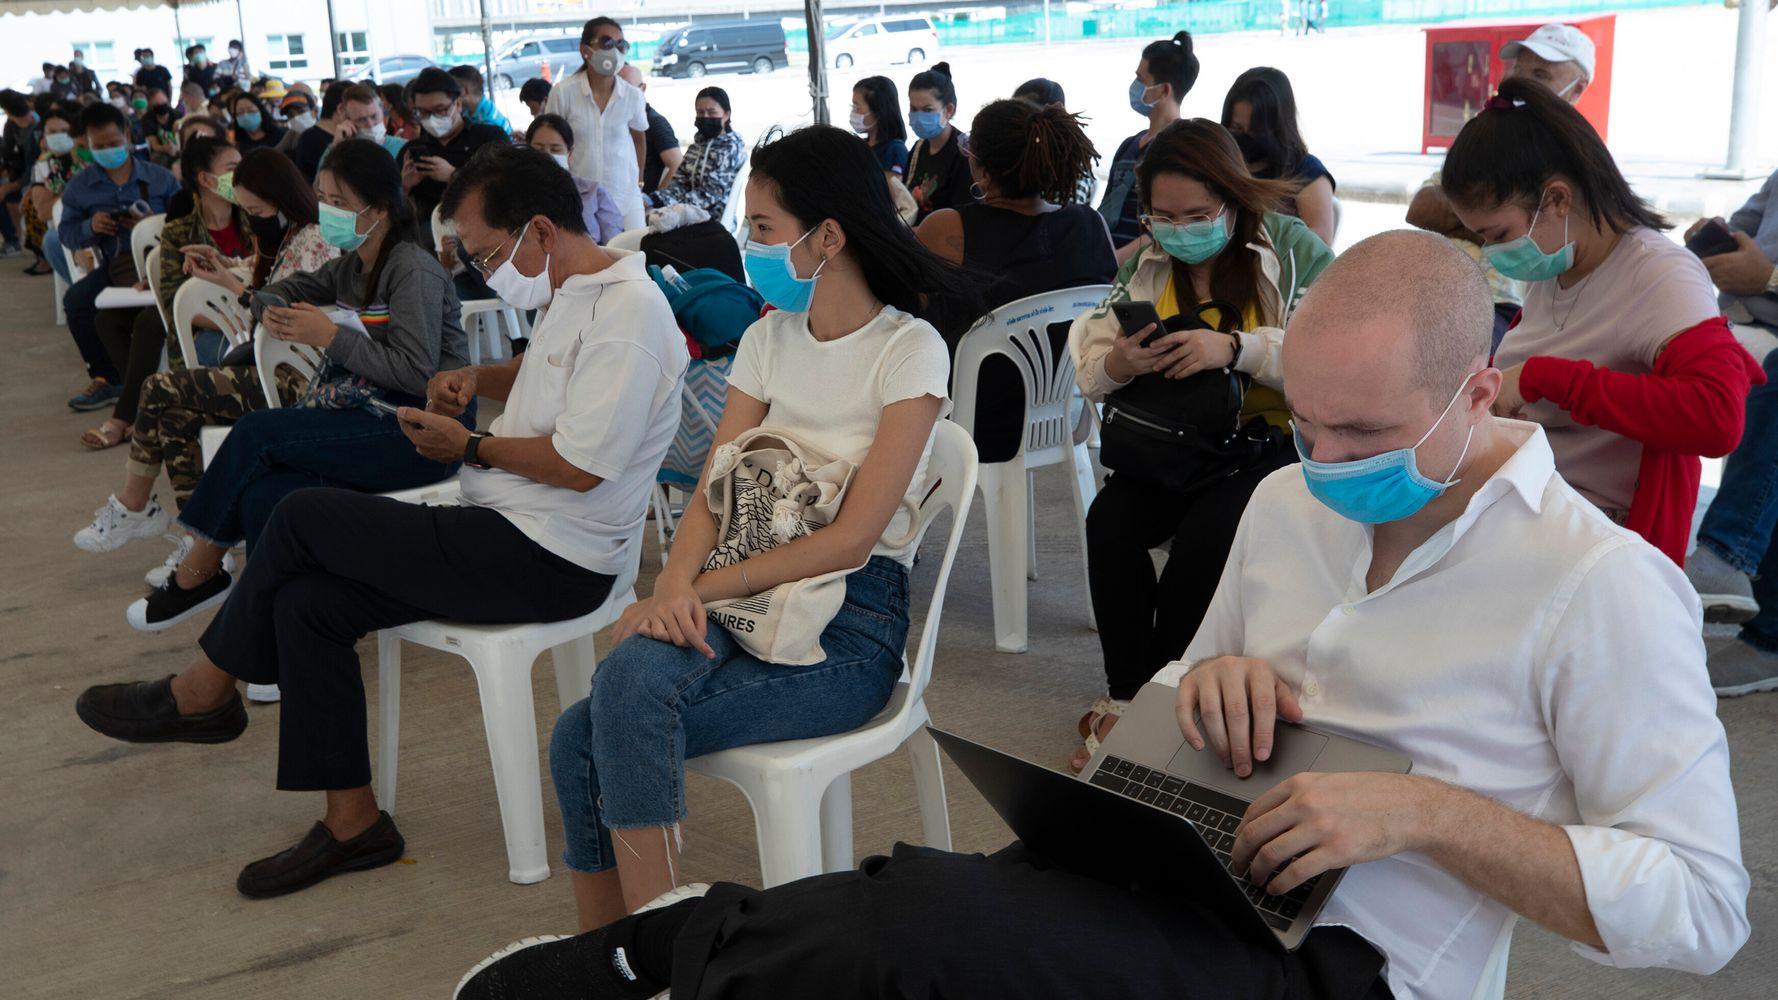 Coronavirus Live Updates: Italy Deaths Hit New Record, Peak Still Yet To Come